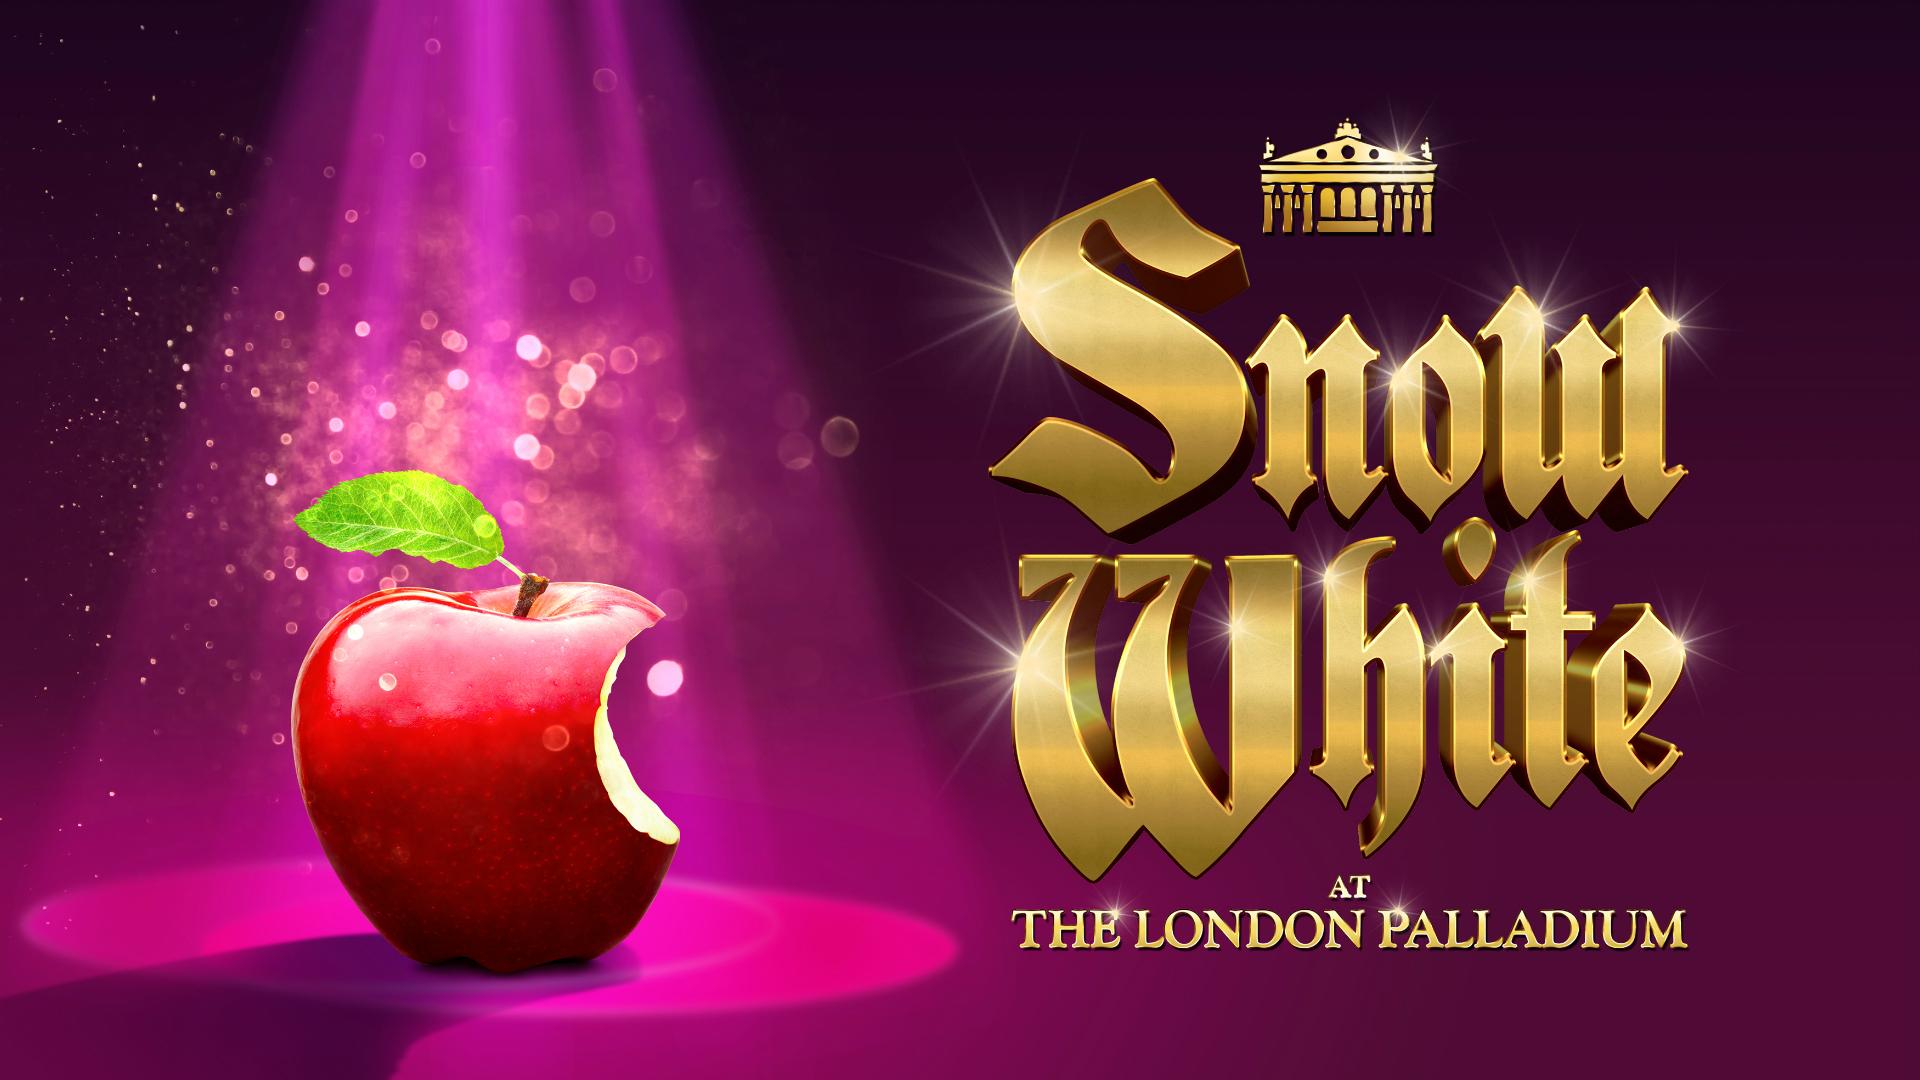 Snow White at the London Palladium. Image courtesy of Premier PR